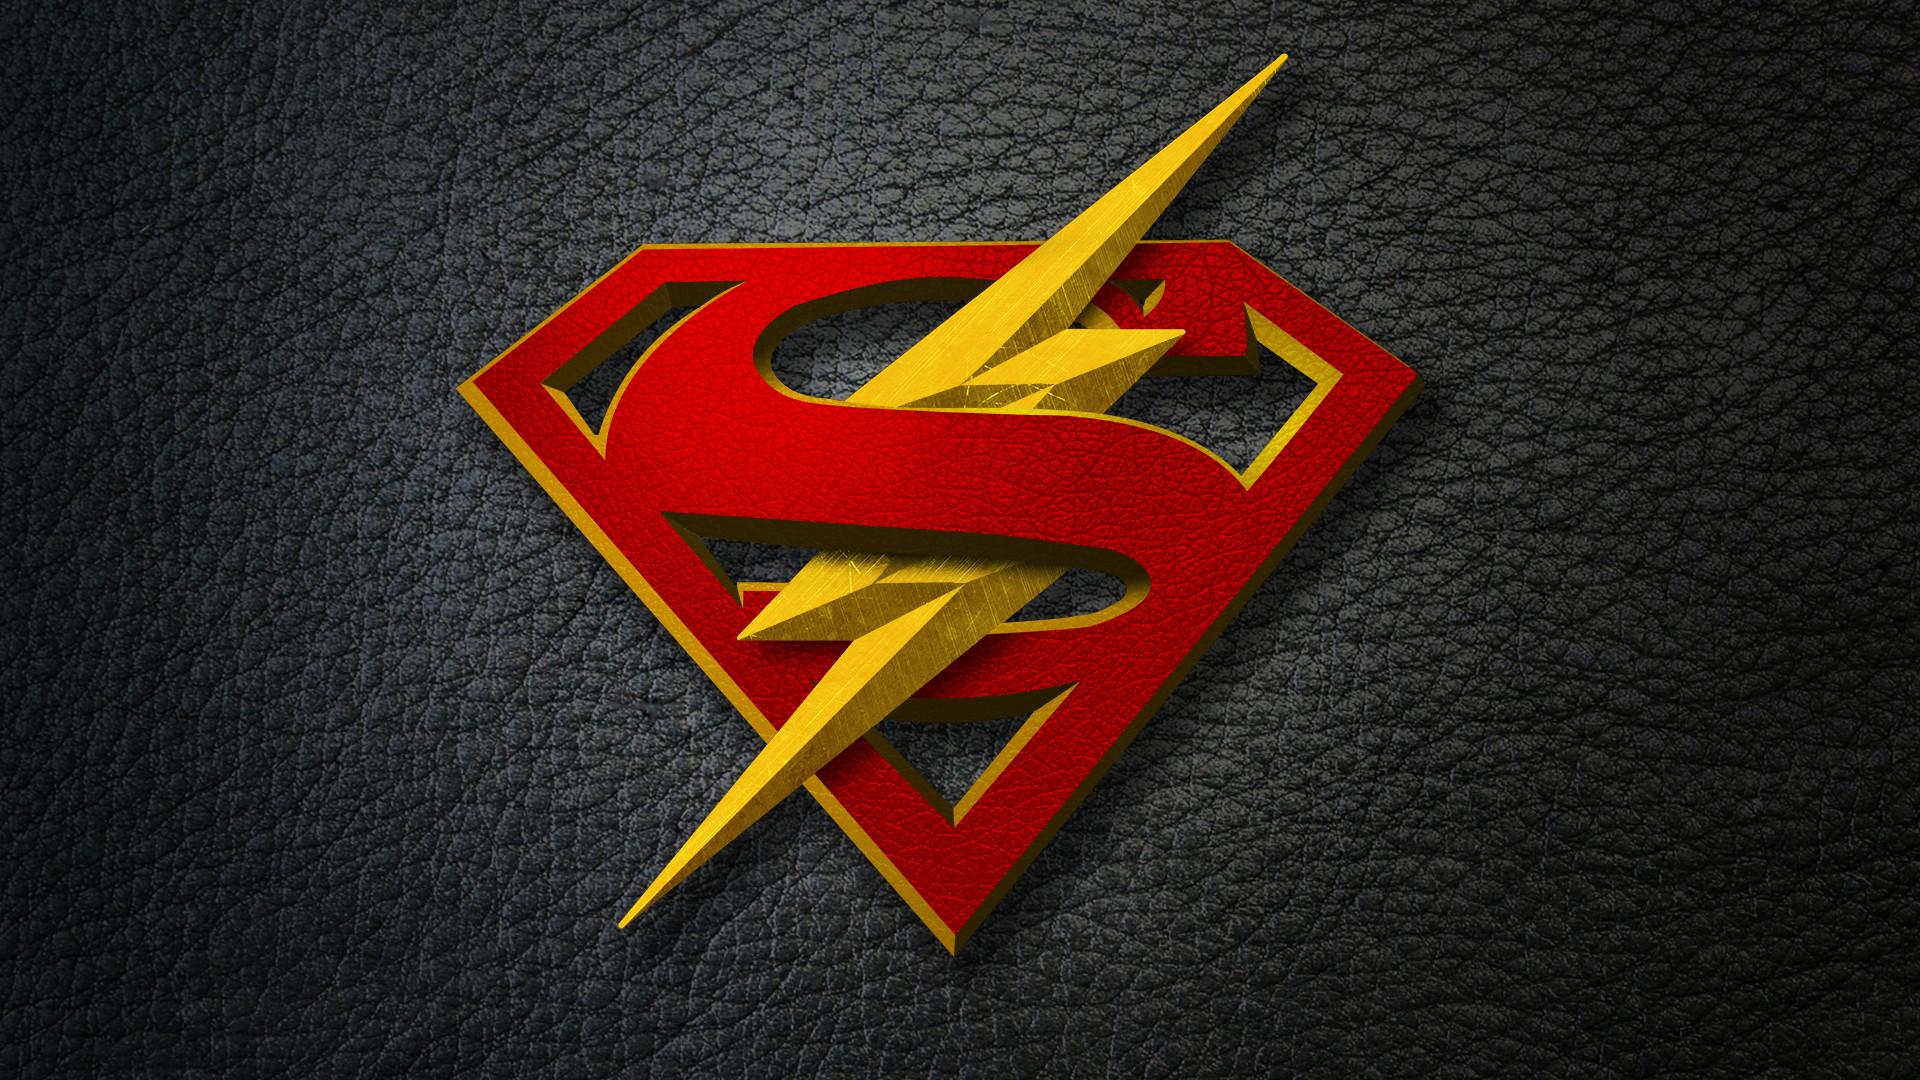 flash symbol wallpaper 66 images